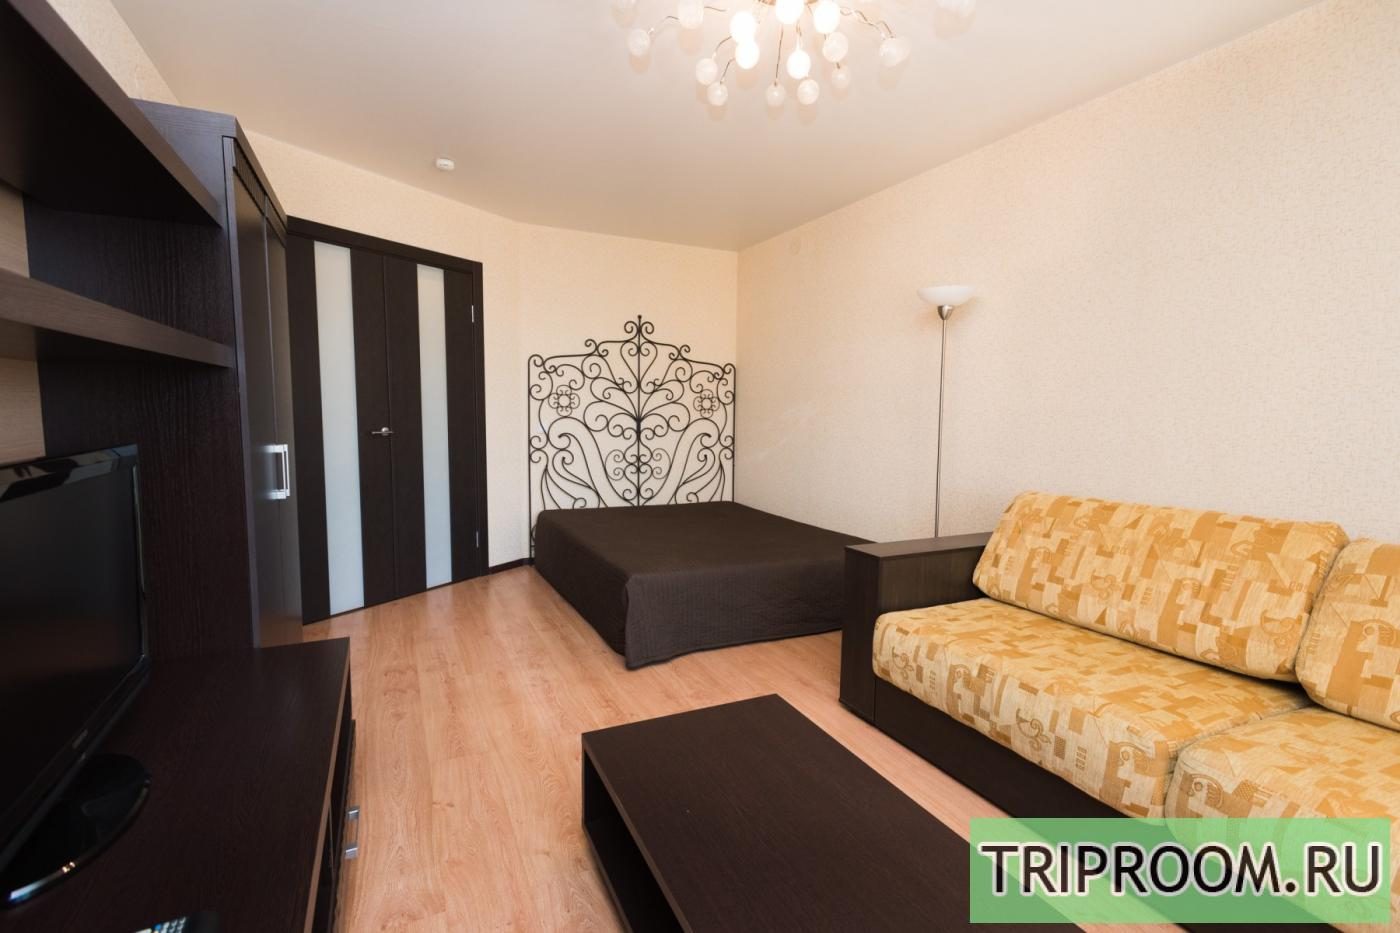 1-комнатная квартира посуточно (вариант № 16259), ул. Смазчиков улица, фото № 1